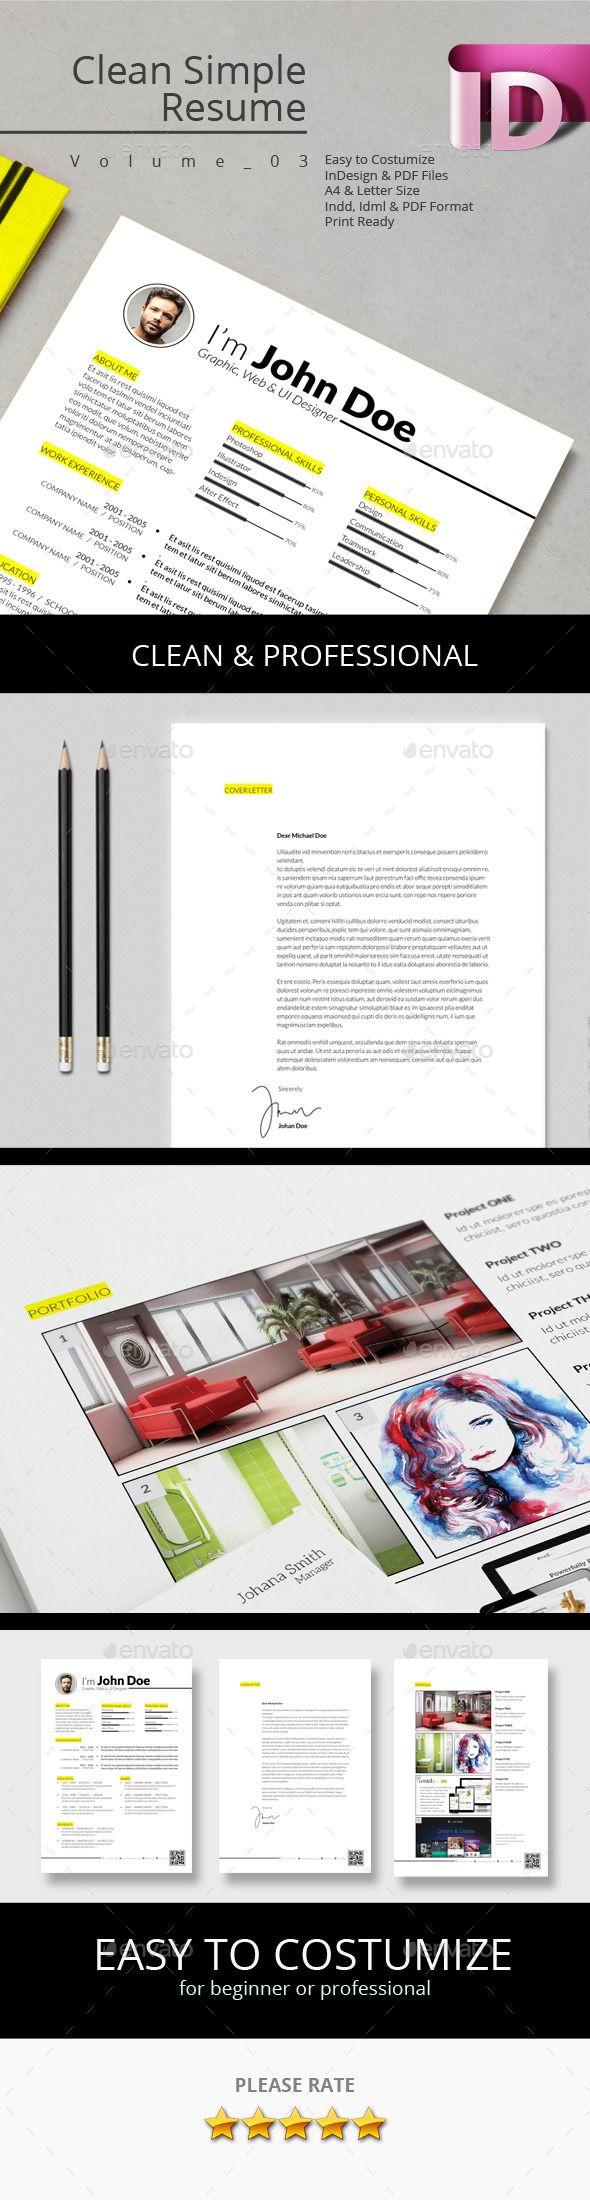 Clean Simple Resume V 03 Simple Resume Modern Resume And